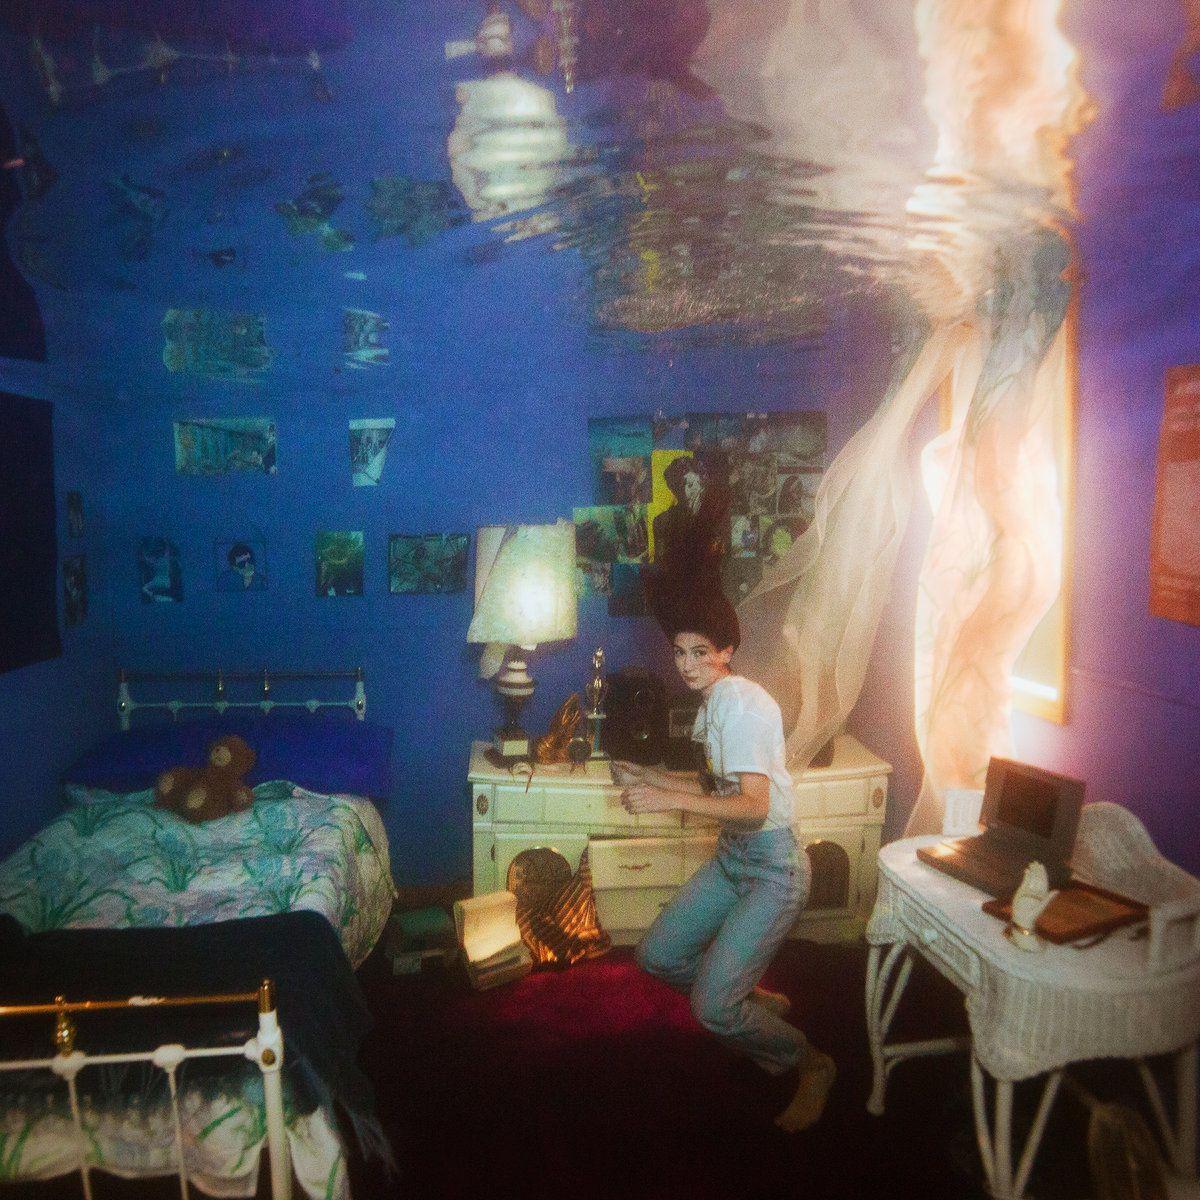 """Titanic Rising"", de Weyes Blood: a gloriosa emersão da nova pop barroca"